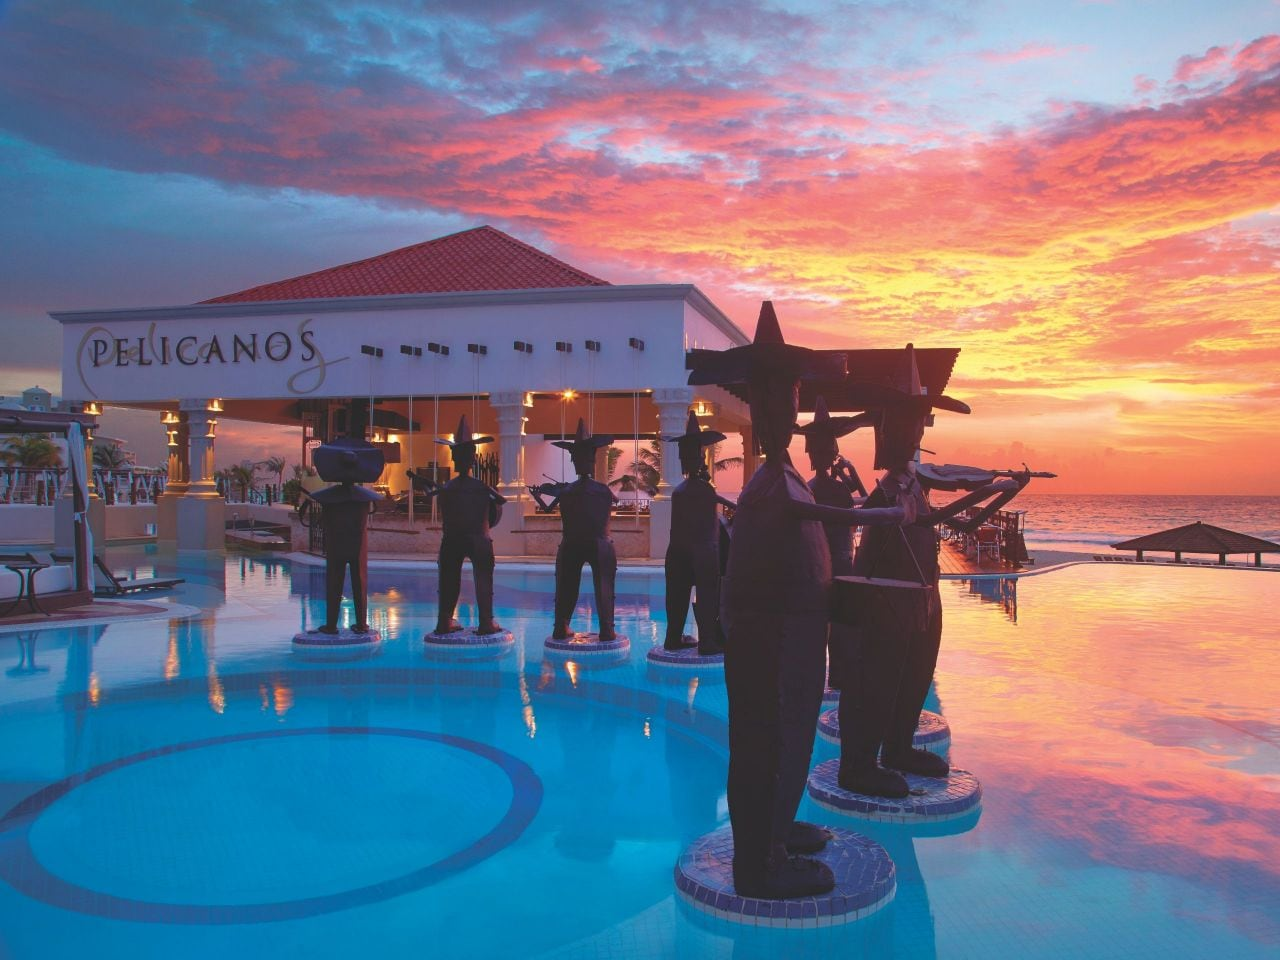 Pool bar at sunset